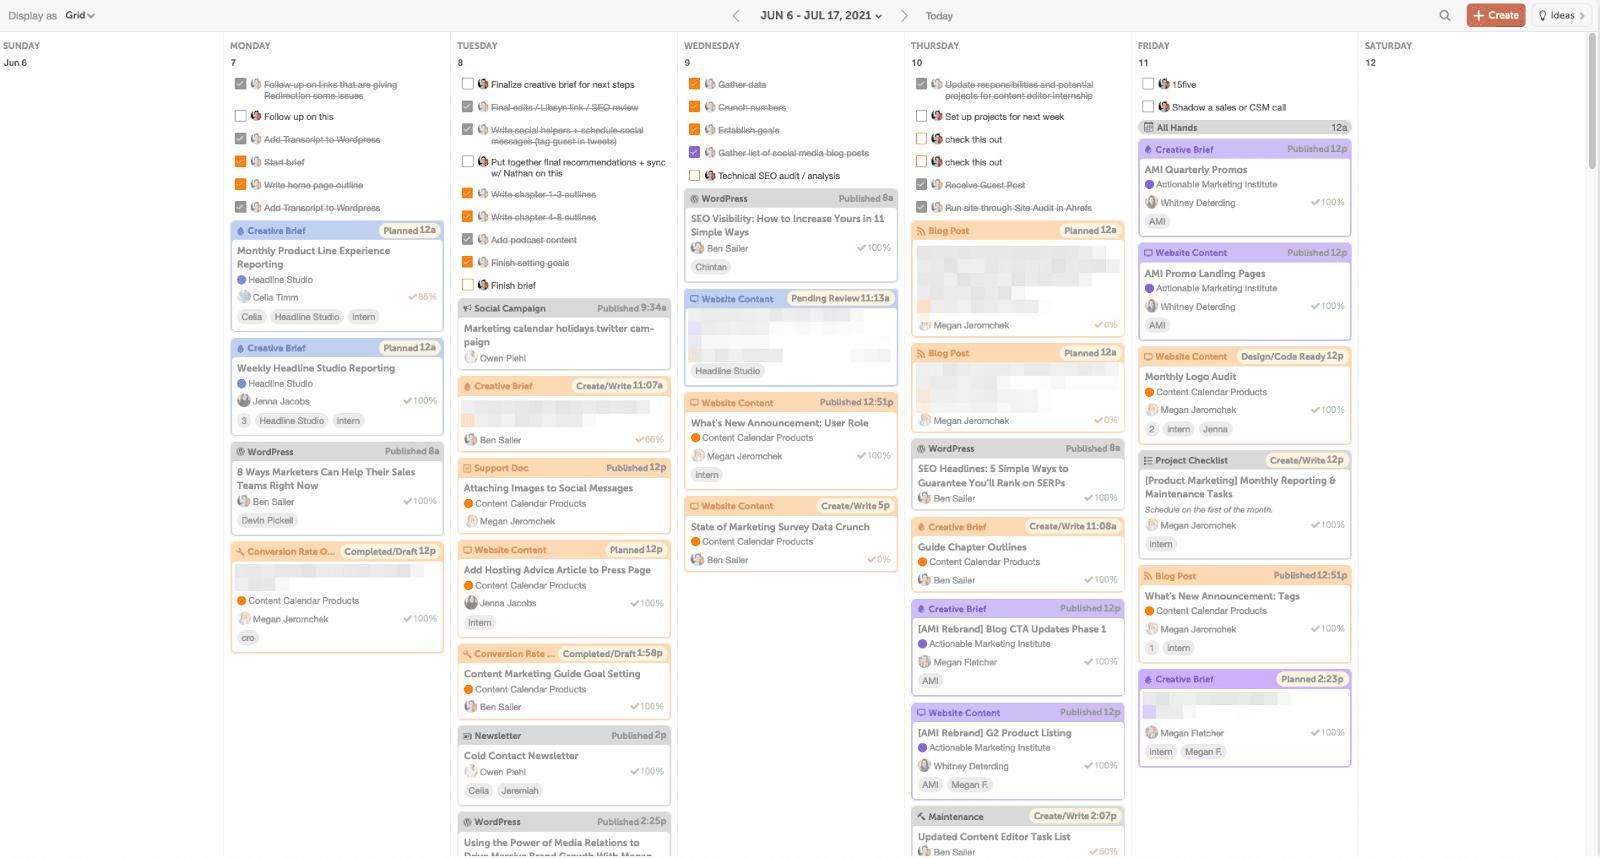 Full content calendar